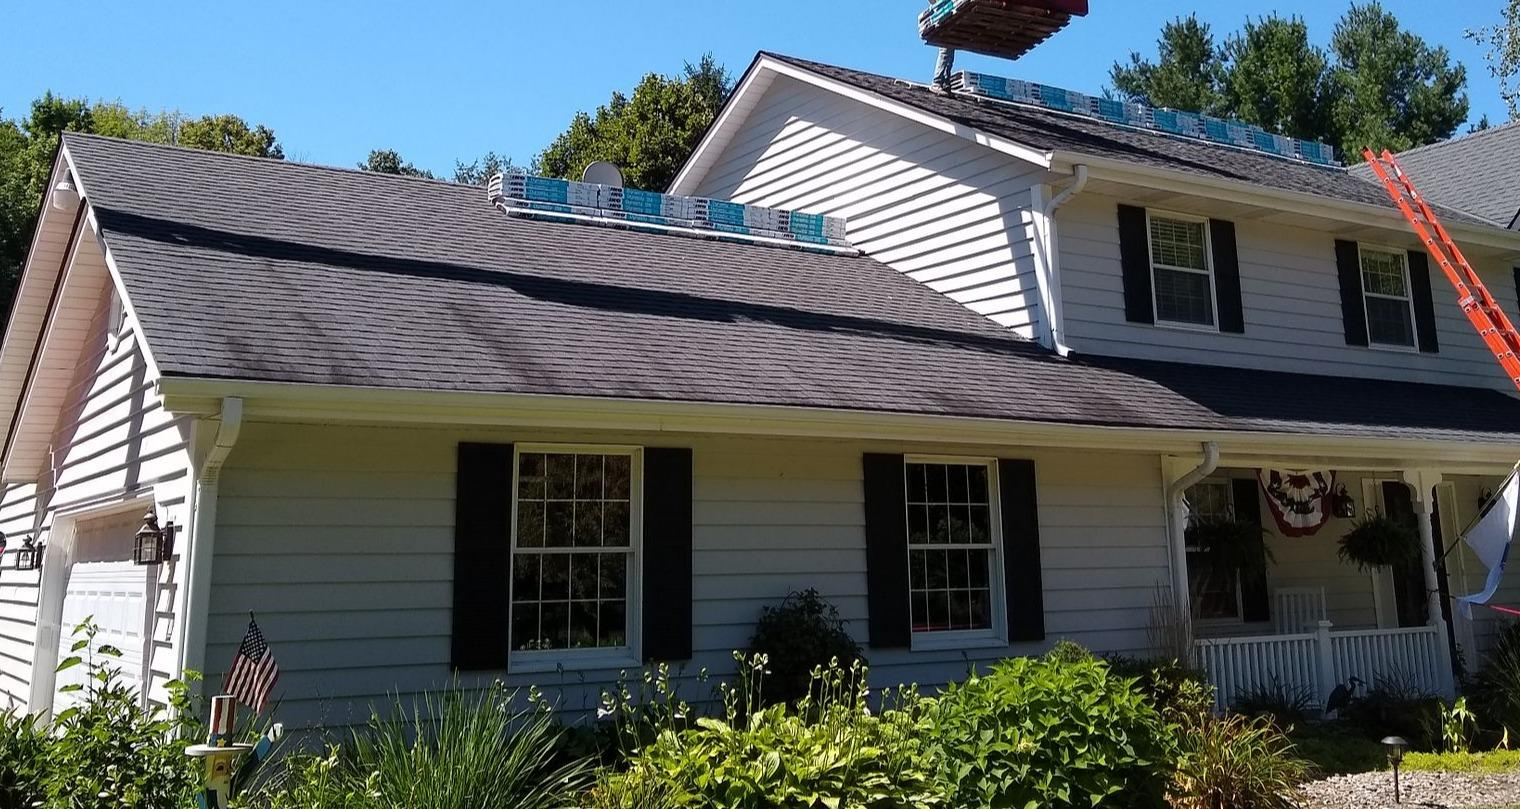 Roof Replacment - Oconomowoc, WI - Before Photo